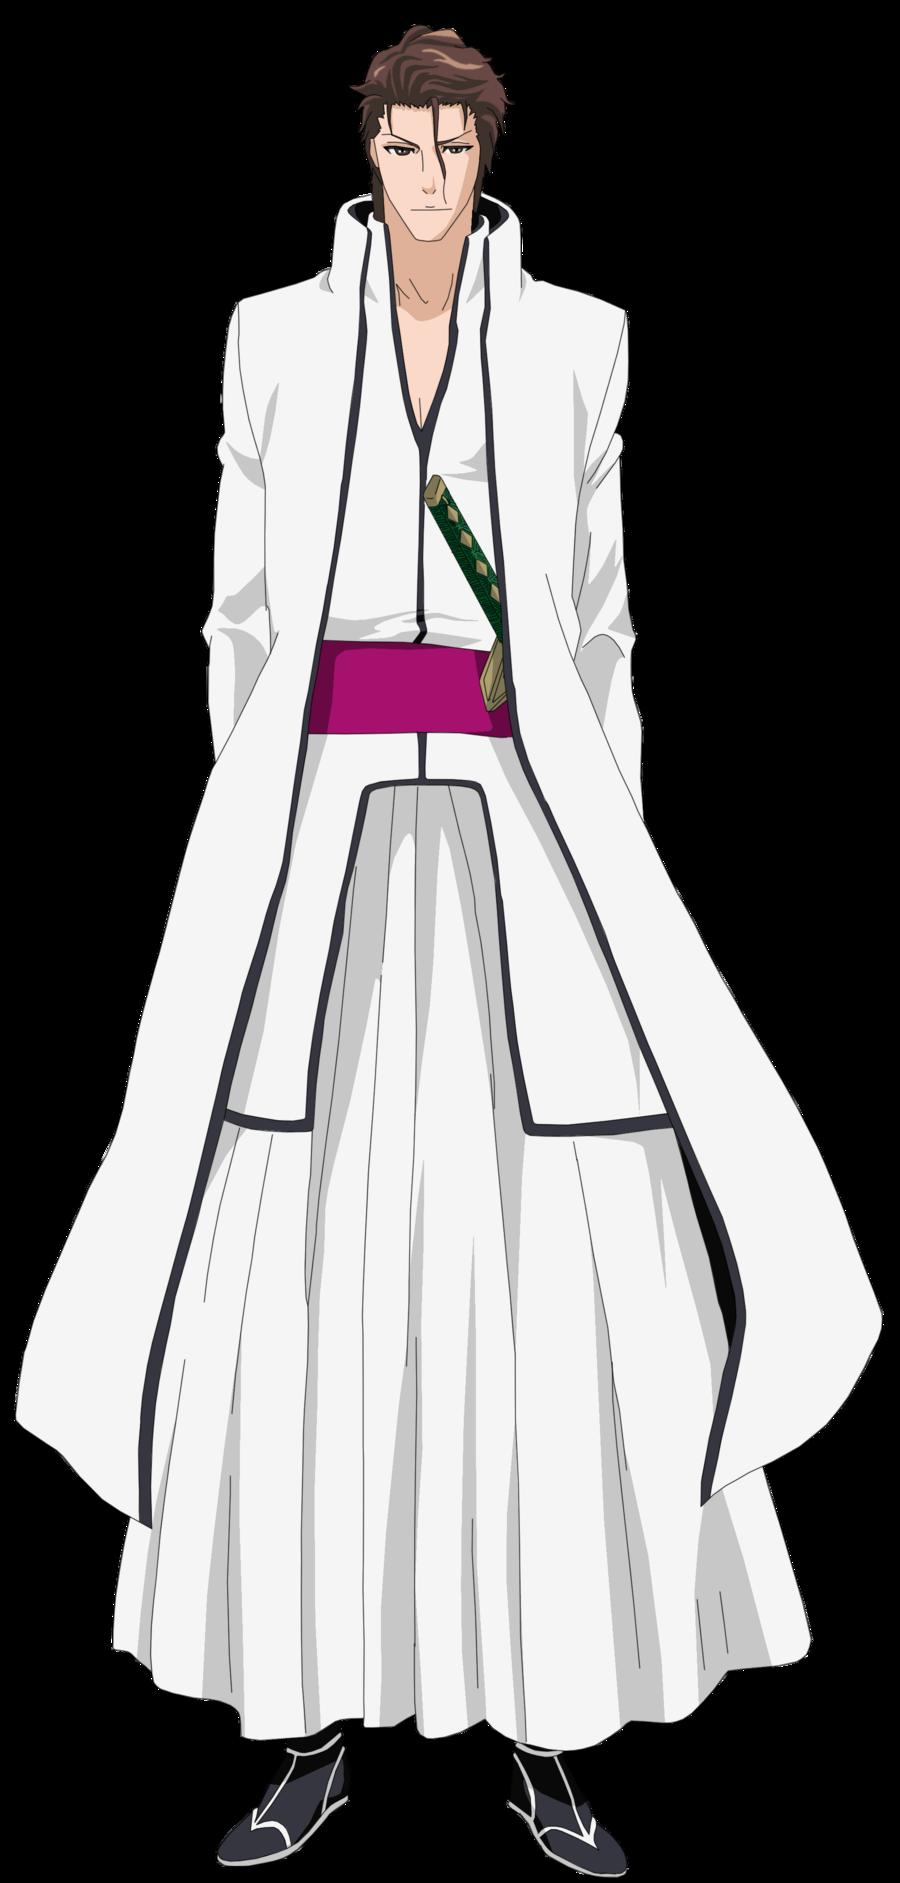 Madara Uchiha(Naruto) vs Aizen(Bleach)   SpaceBattles Forums  Madara Uchiha(N...